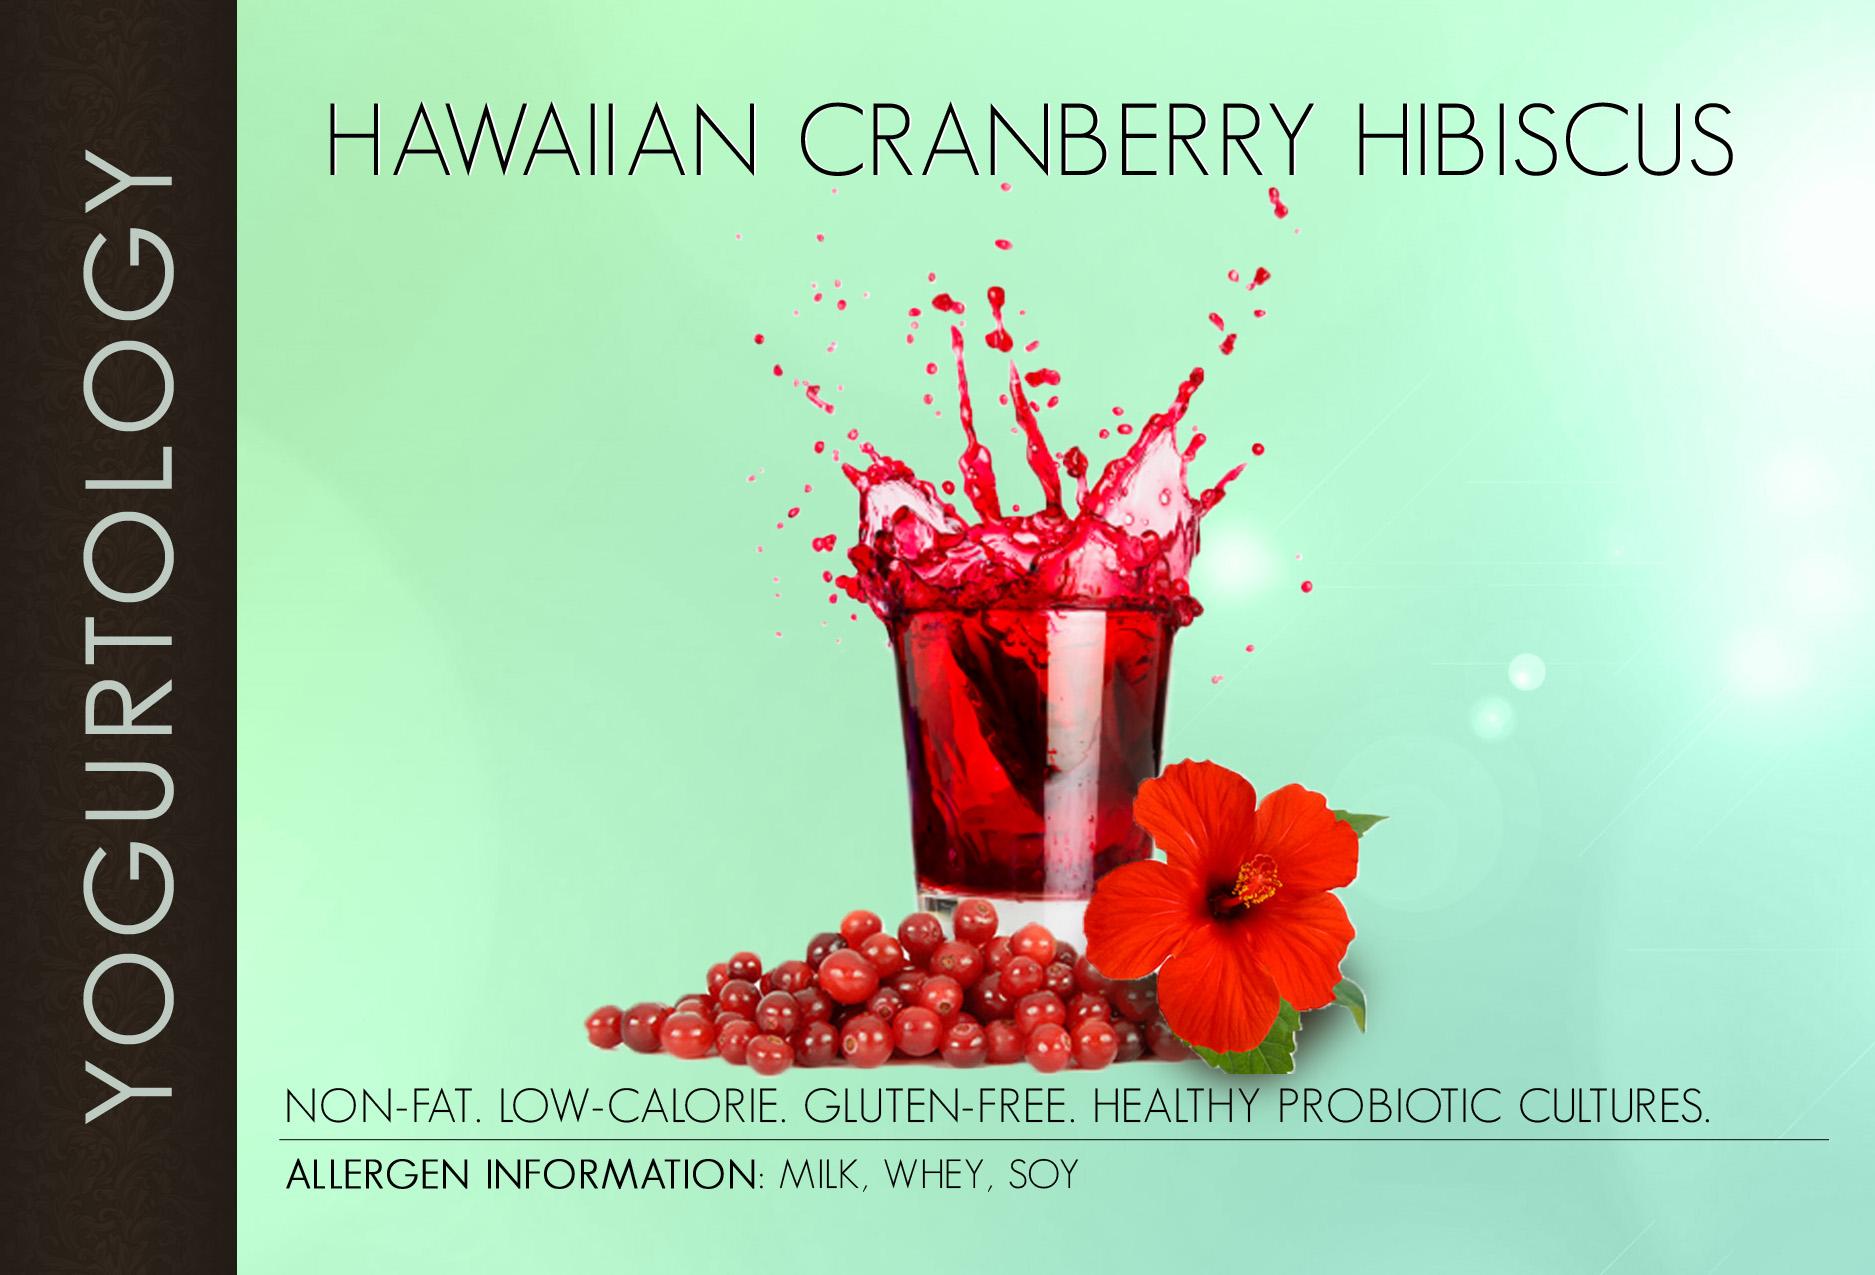 Hawaiian Cranberry Hibiscus